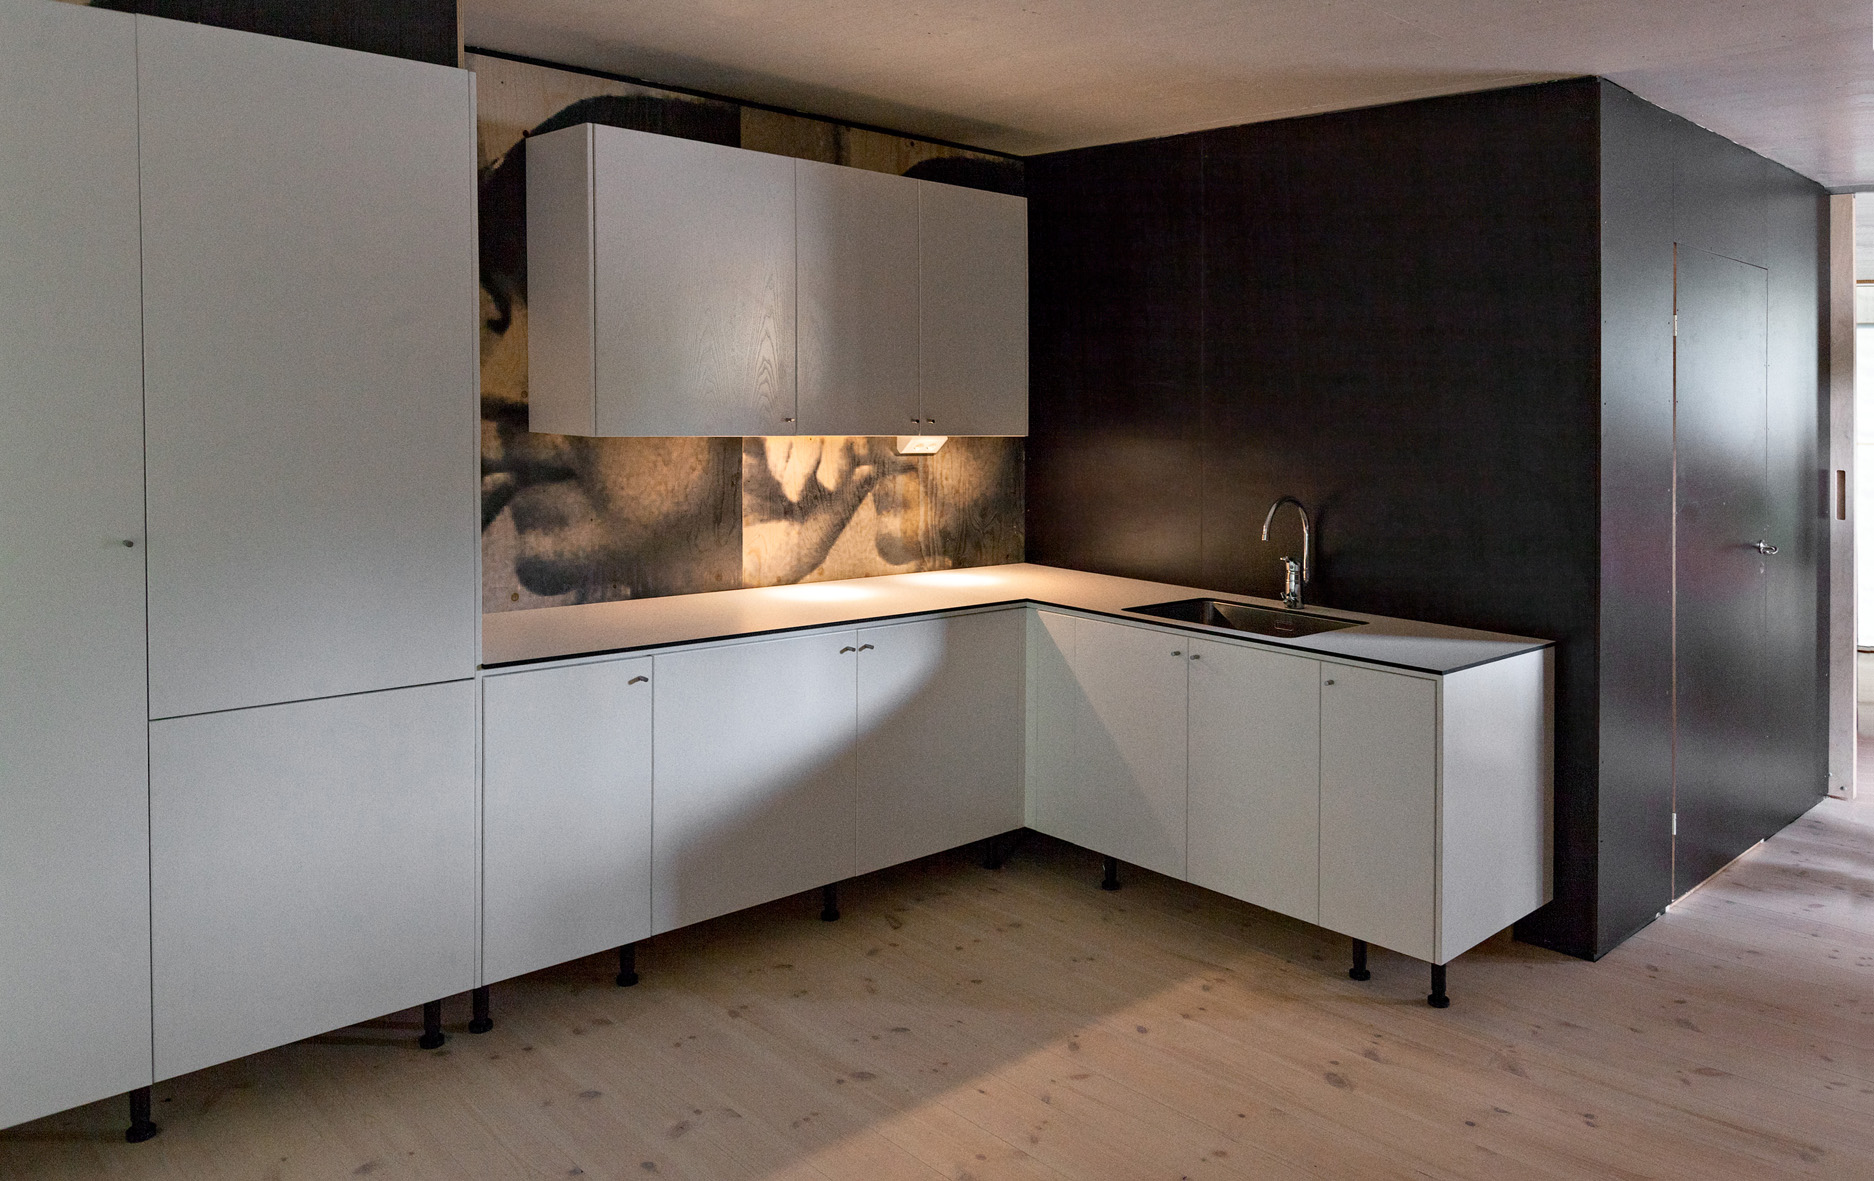 Bostadsprotoyp 1.0 Рsmart housing sm̴land